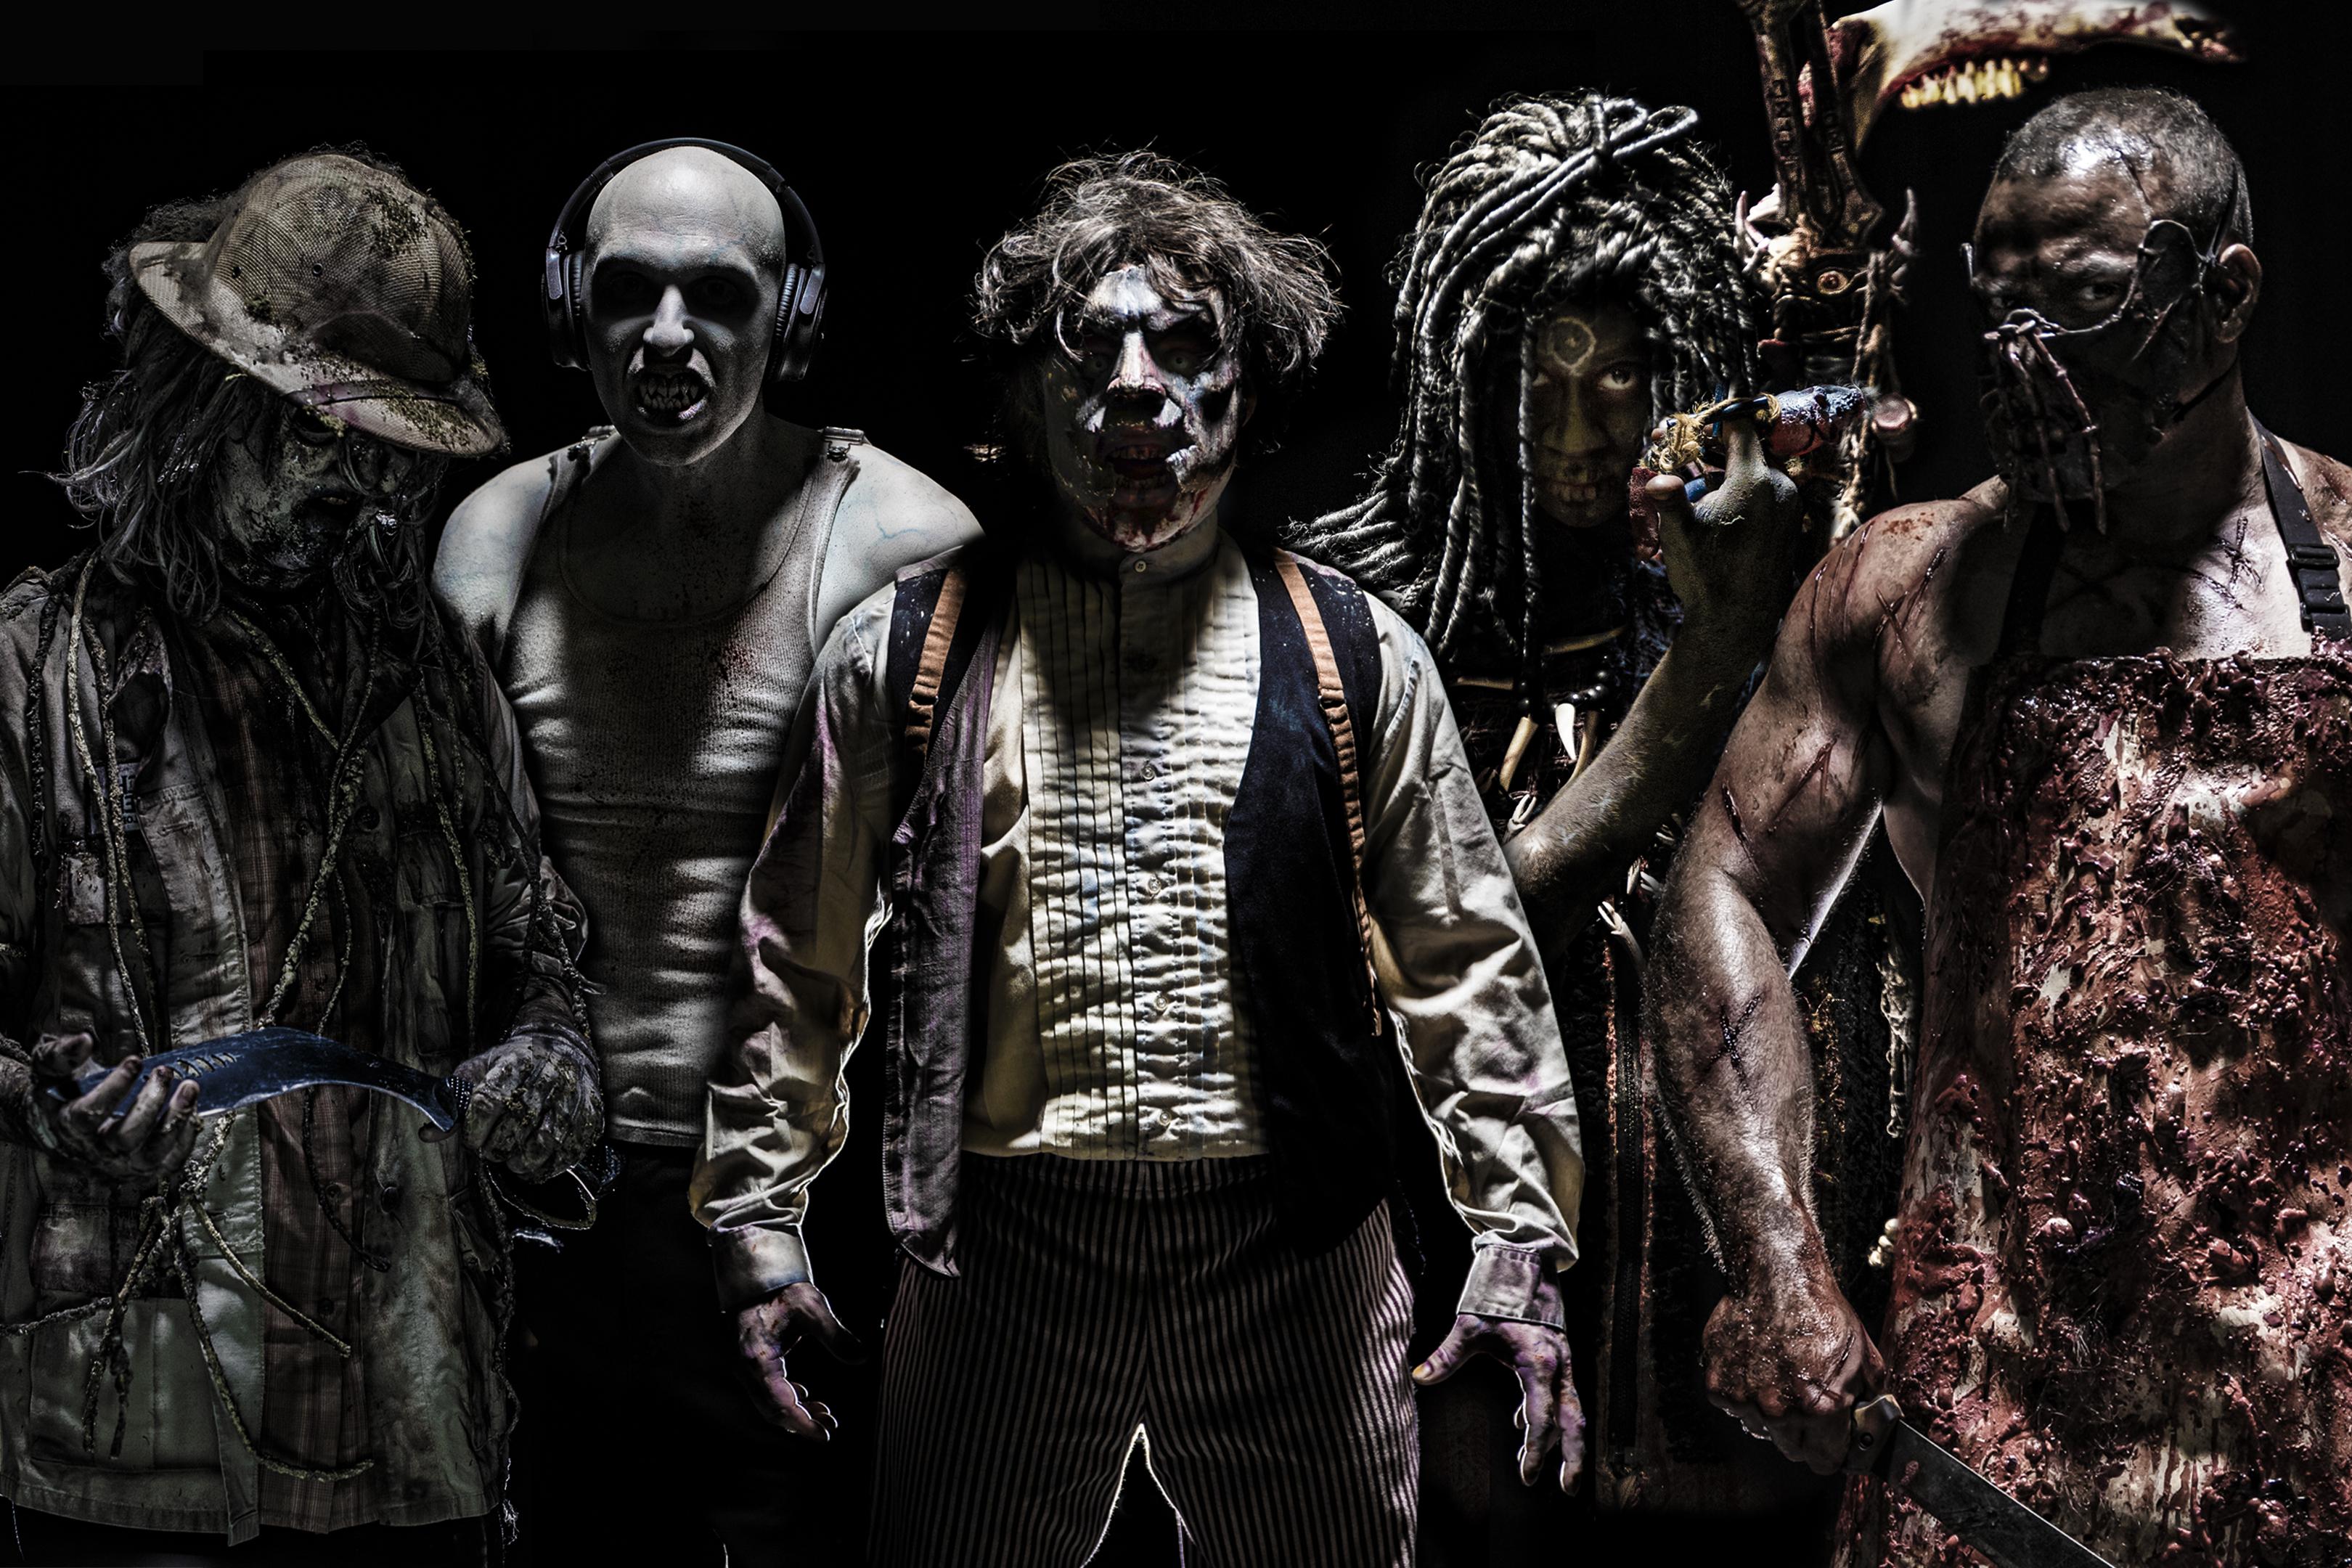 2020 Halloween Events Pinellas Halloween Guide: Halloween Horror Nights, Howl O Scream, Disney's